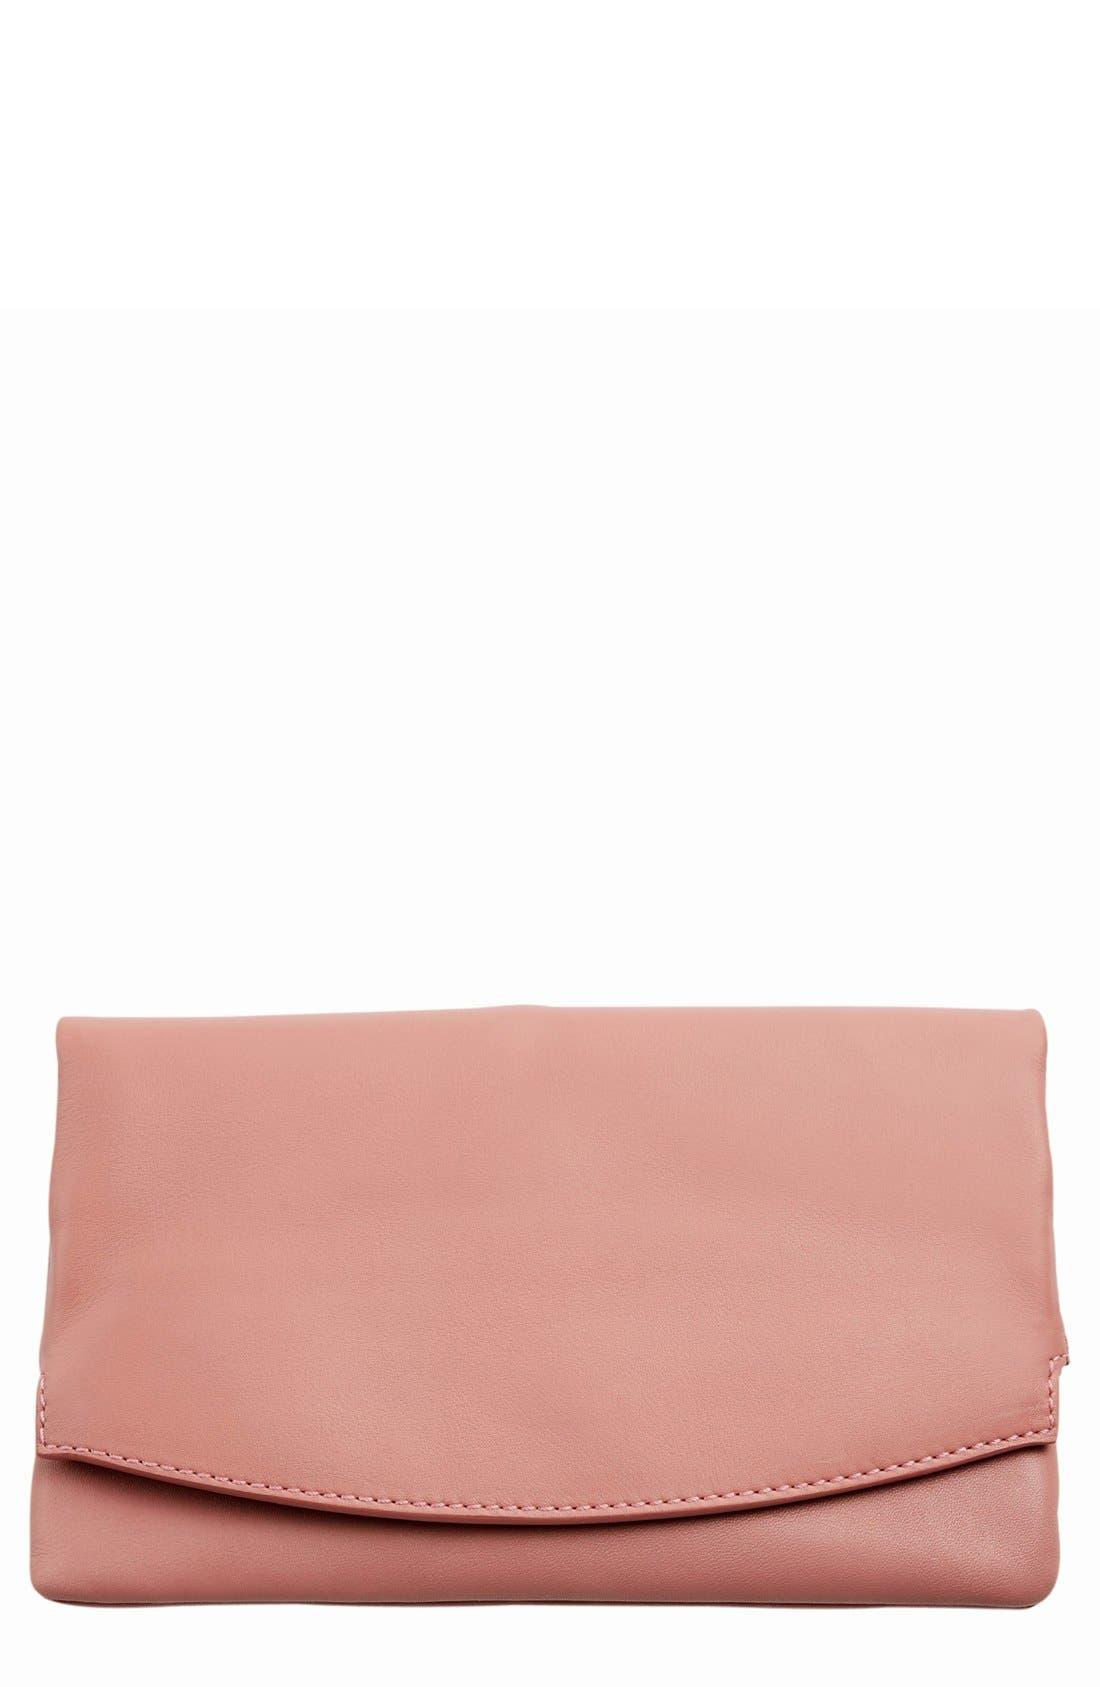 Alternate Image 1 Selected - Skagen 'Anne-Marie' Leather Flap Clutch